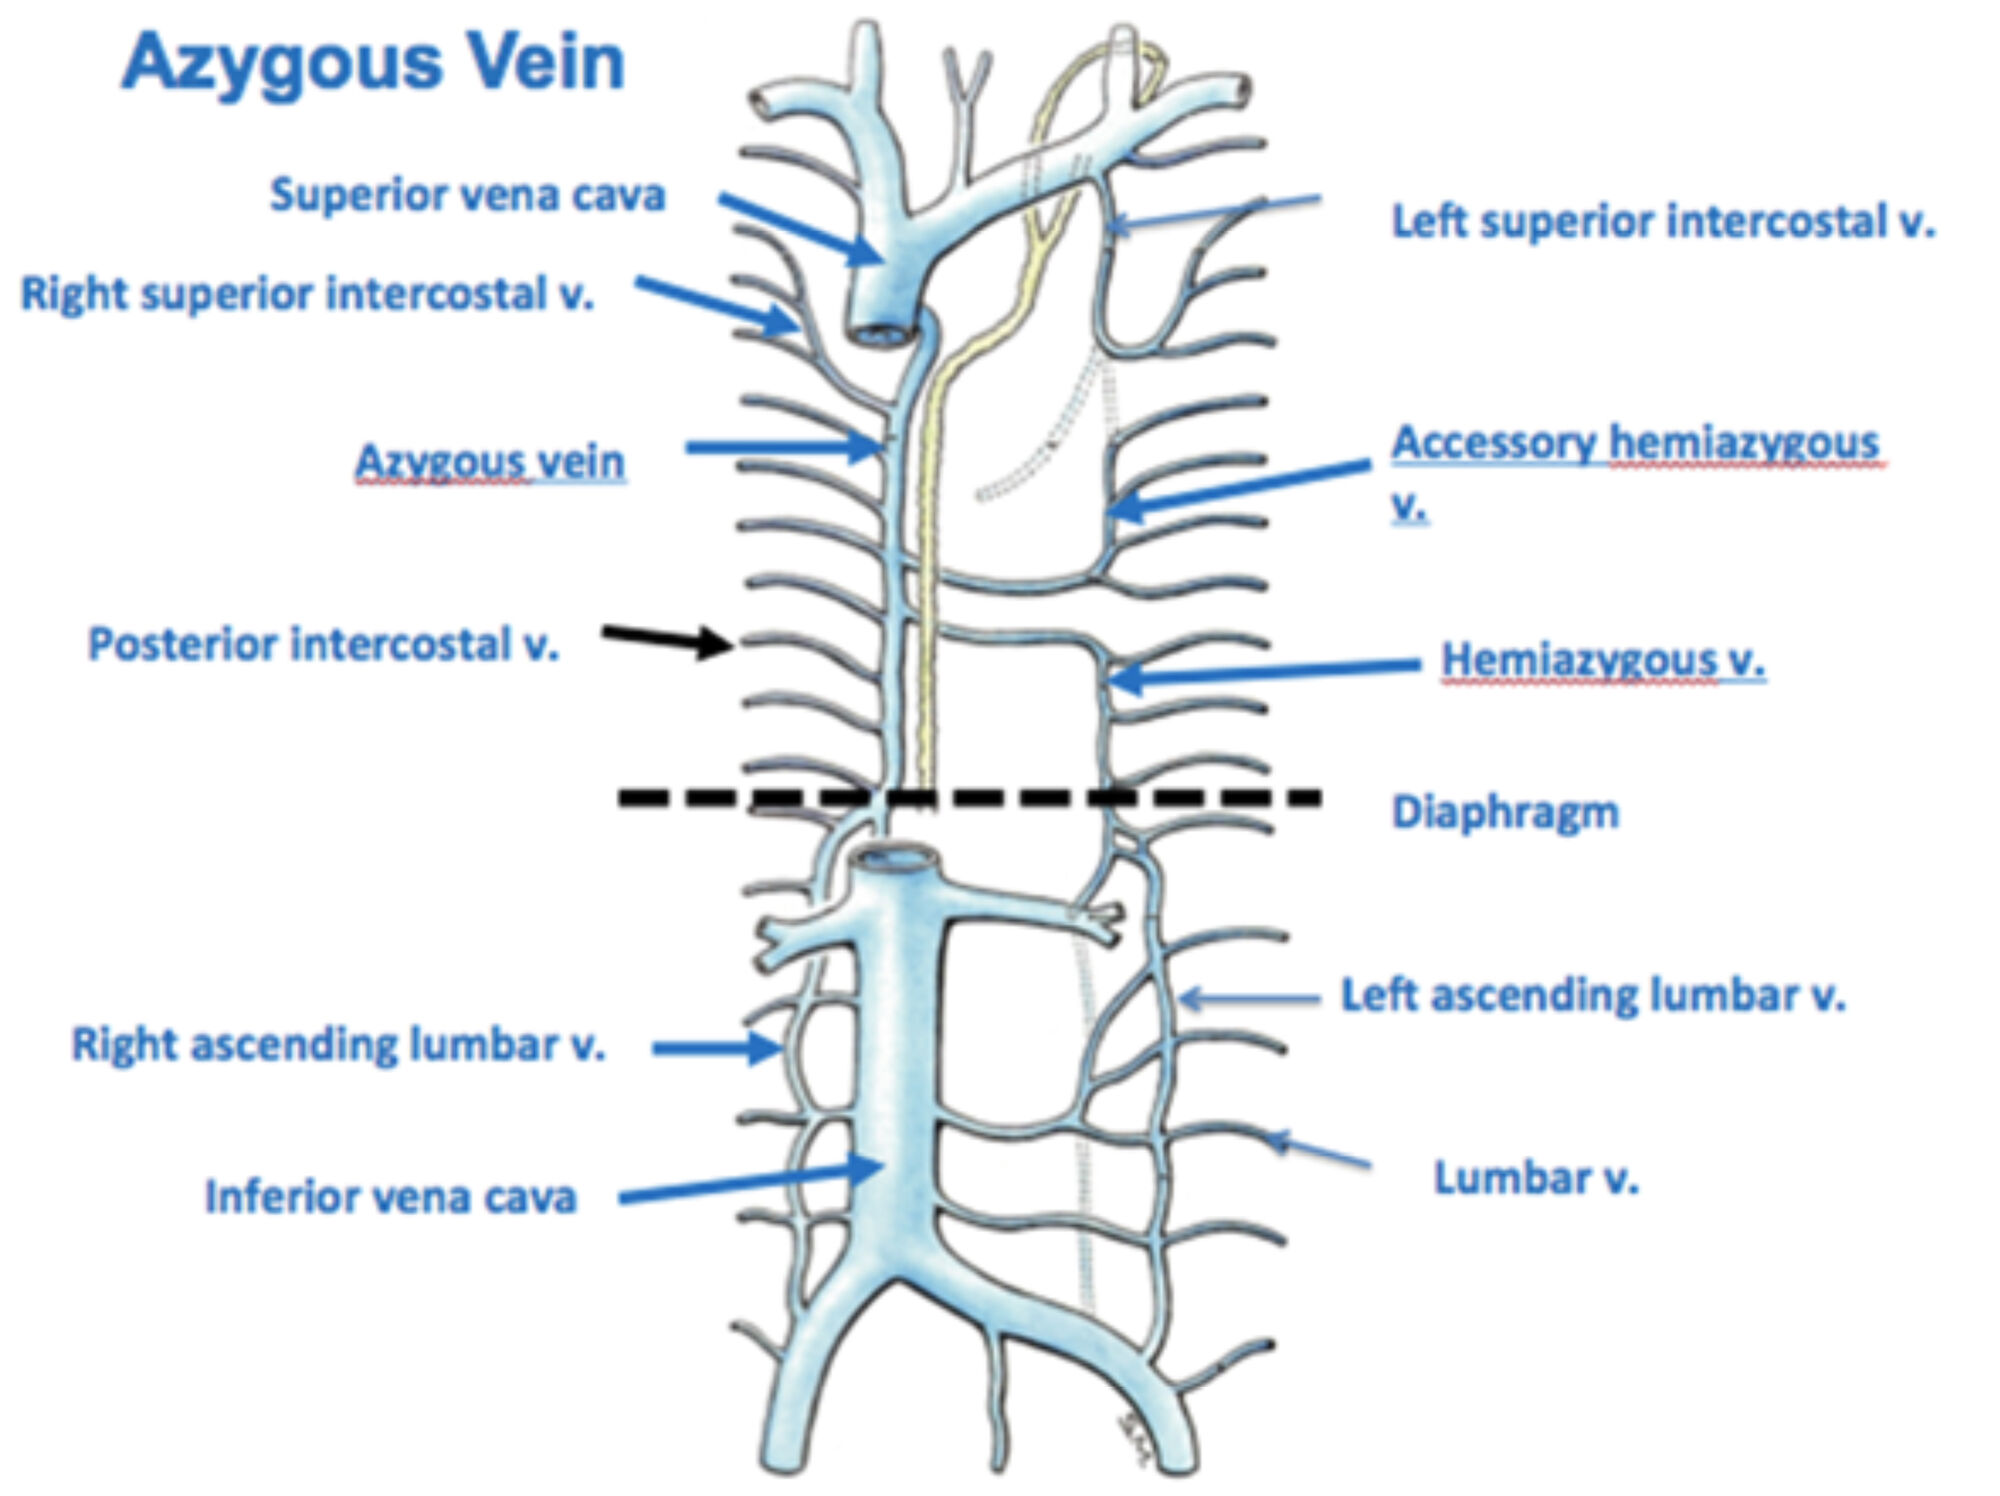 thorax:venous structure:azygous vein | ranzcrpart1 wiki | fandom, Human Body